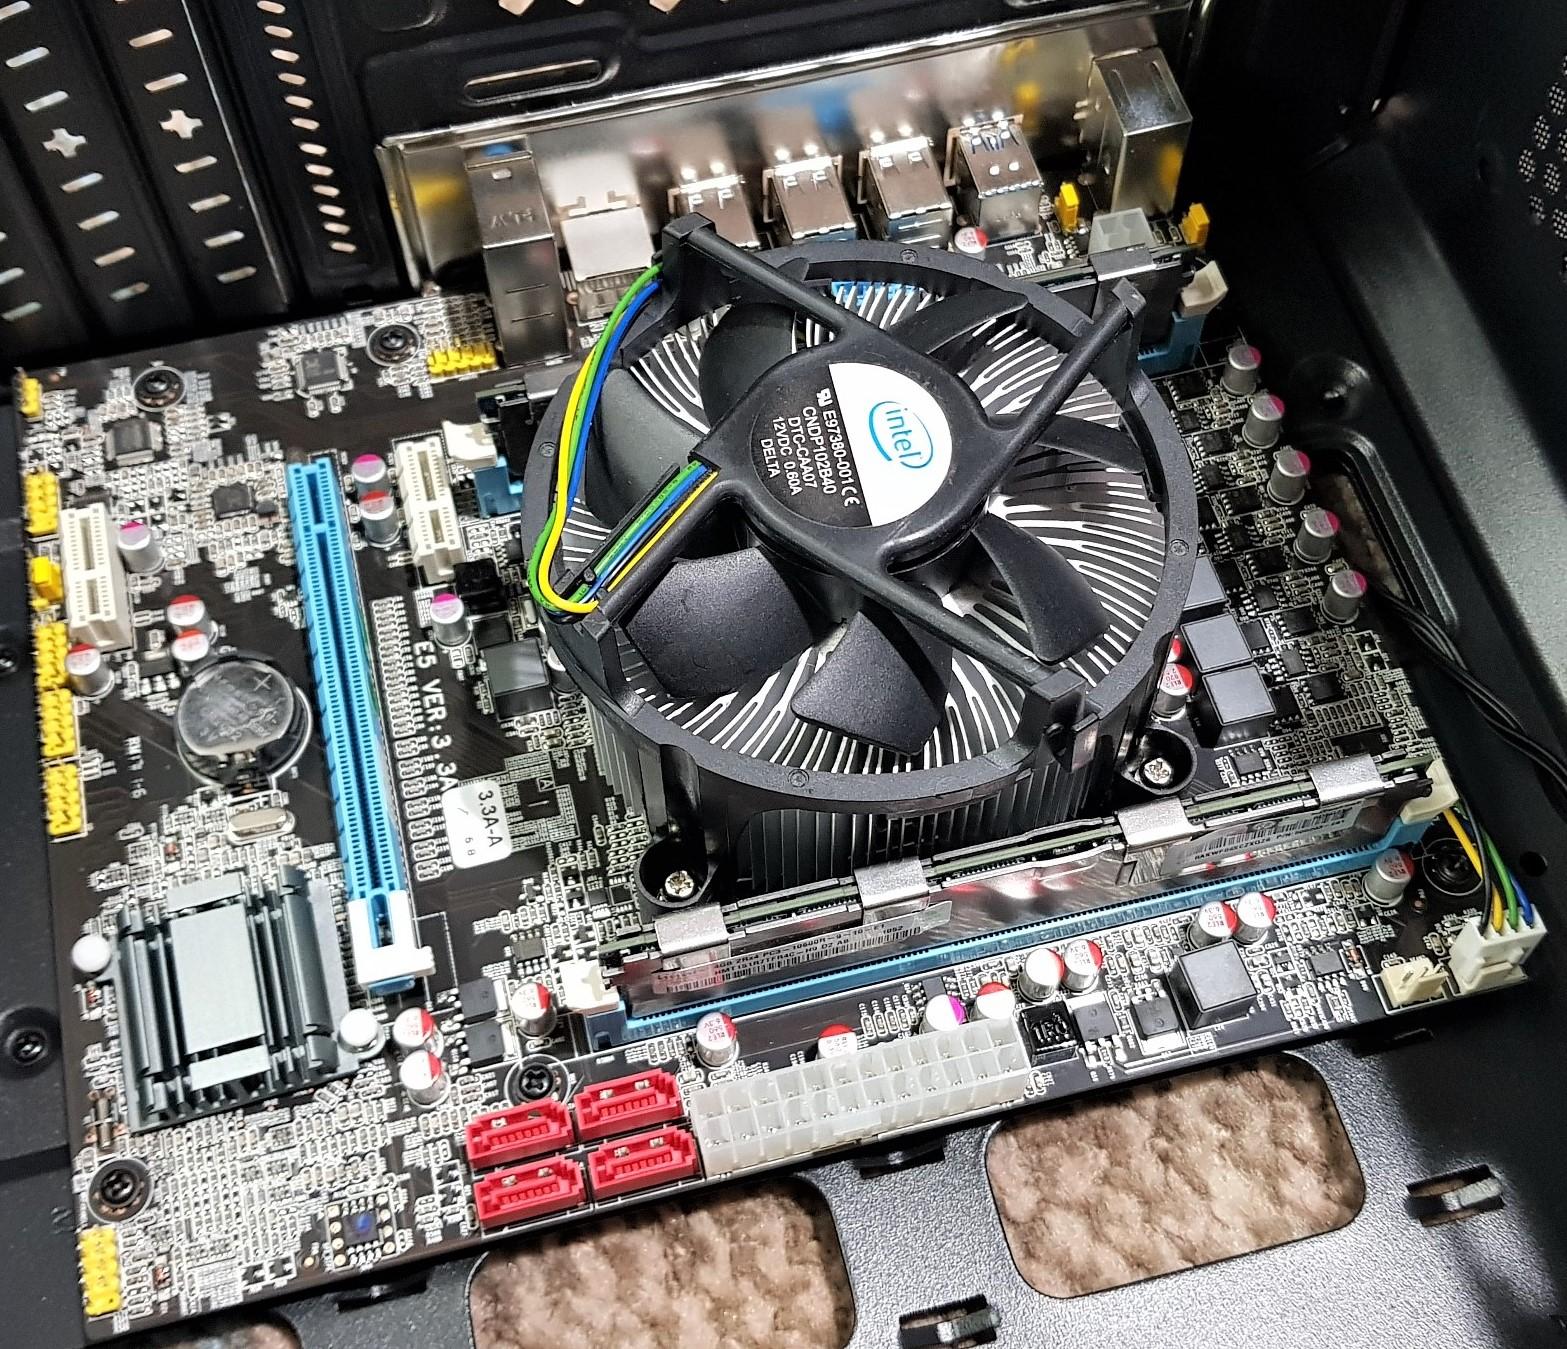 Xeon E5-2660 2 2Ghz 8 Core 16 Thread / Intel X79 / 8GB / Intel Stock  Heatsink